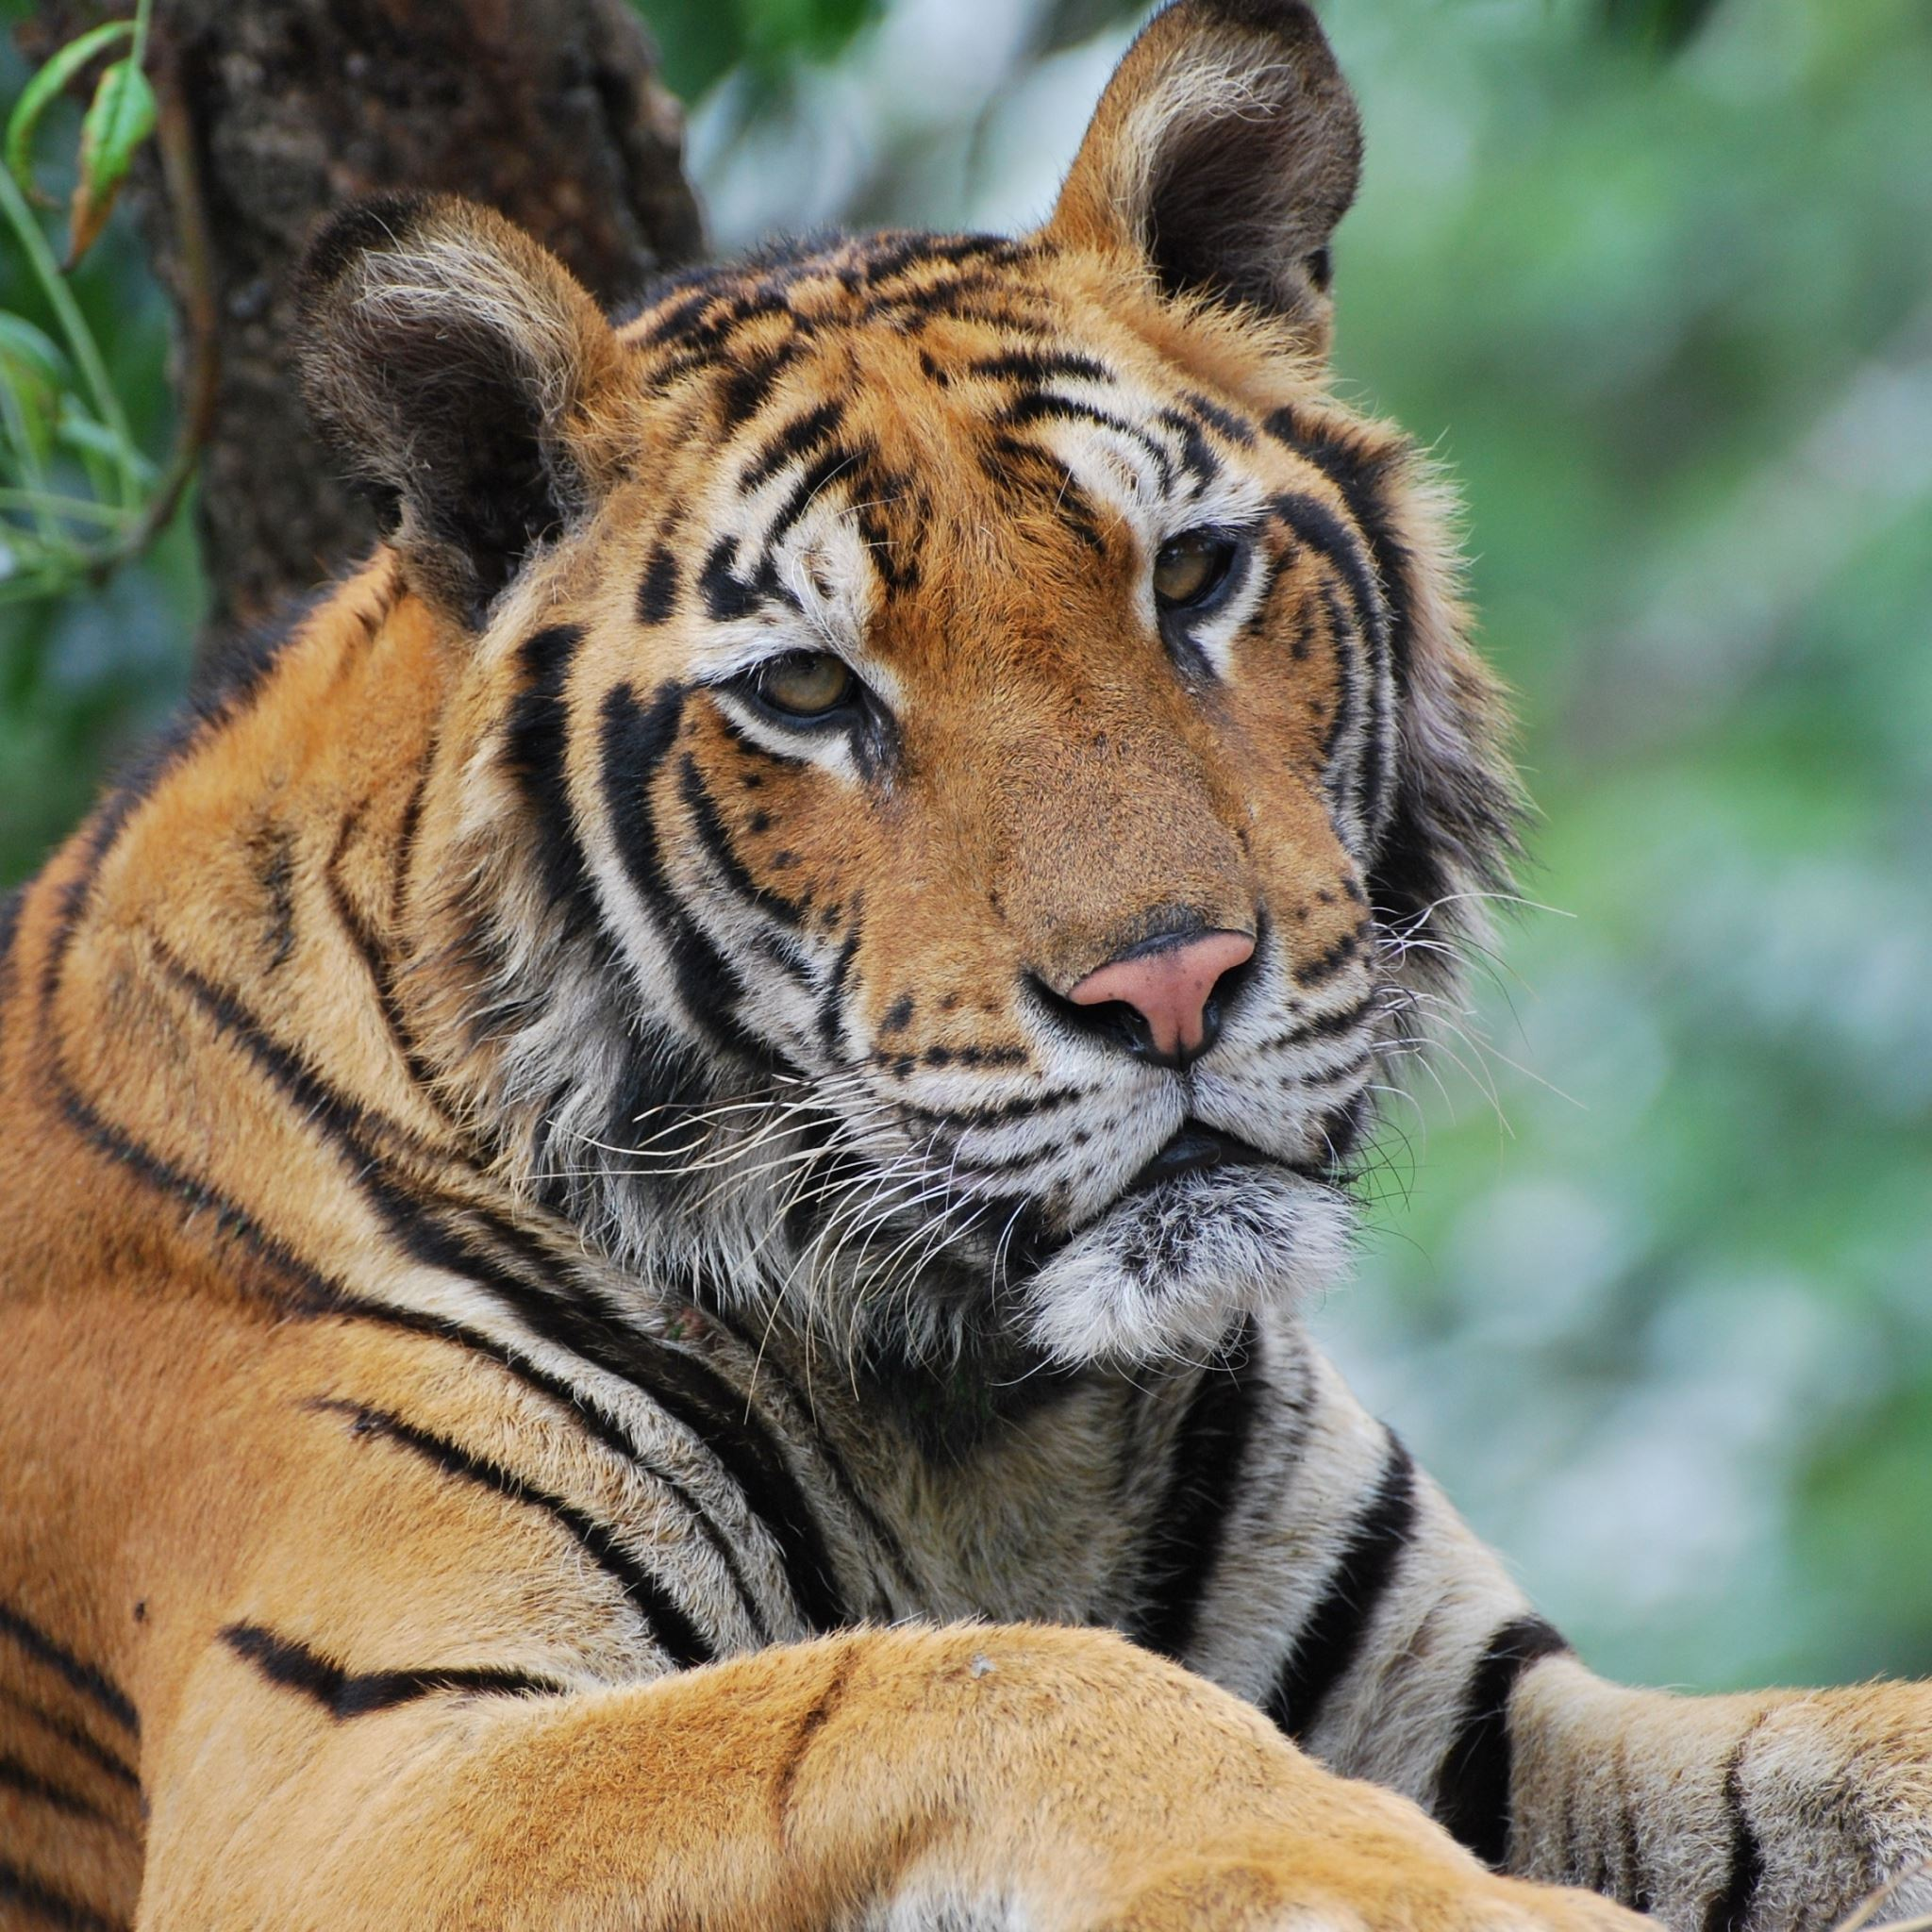 Tiger Predator Face Eyes Sadness iPad Air wallpaper